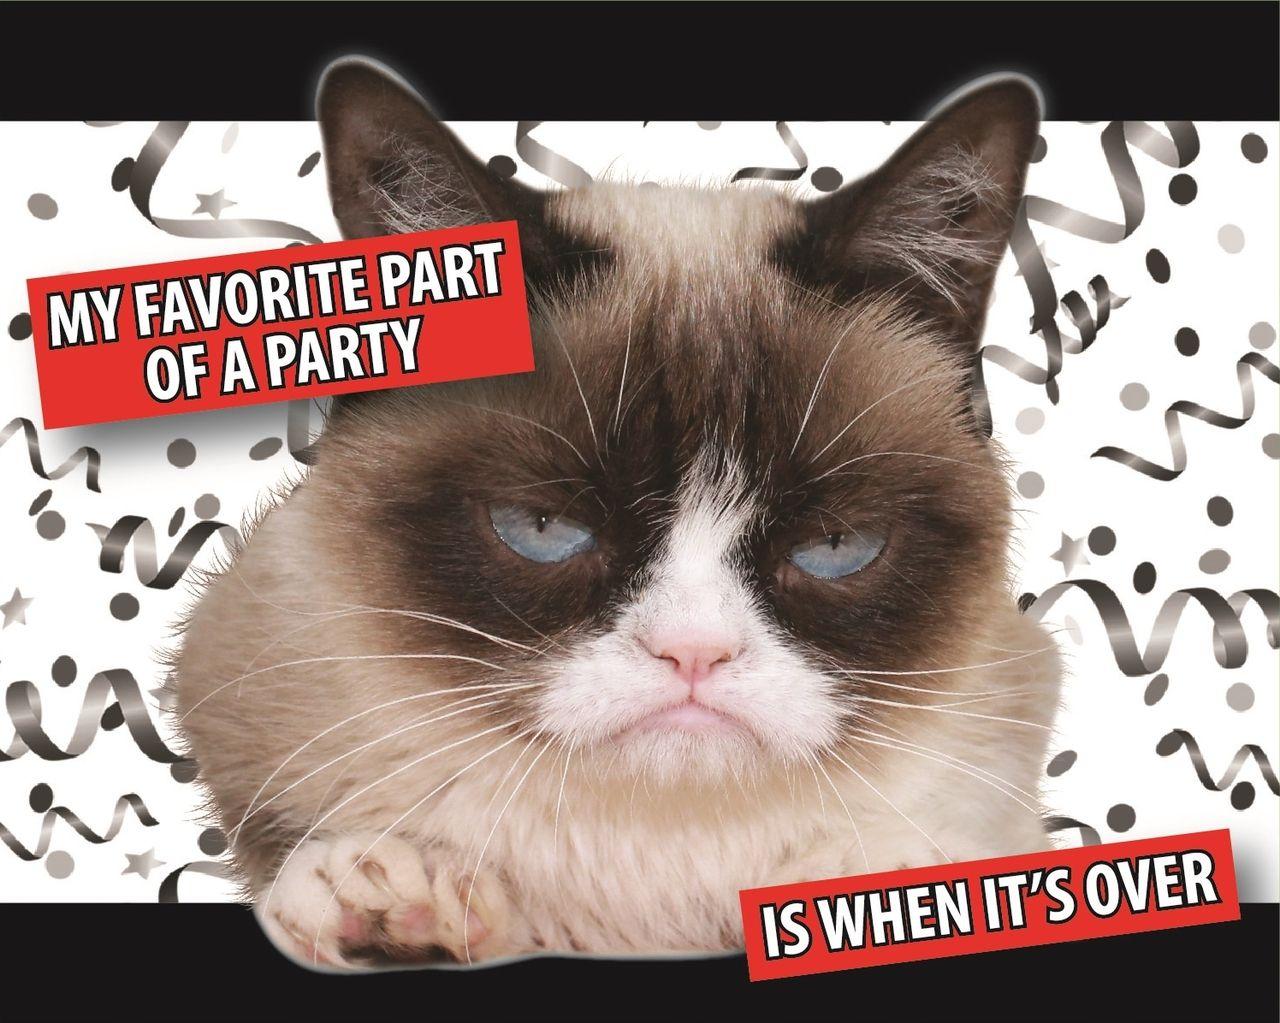 Grumpy Cat Party Invitations Grumpy Cat Party Supplies Grumpy